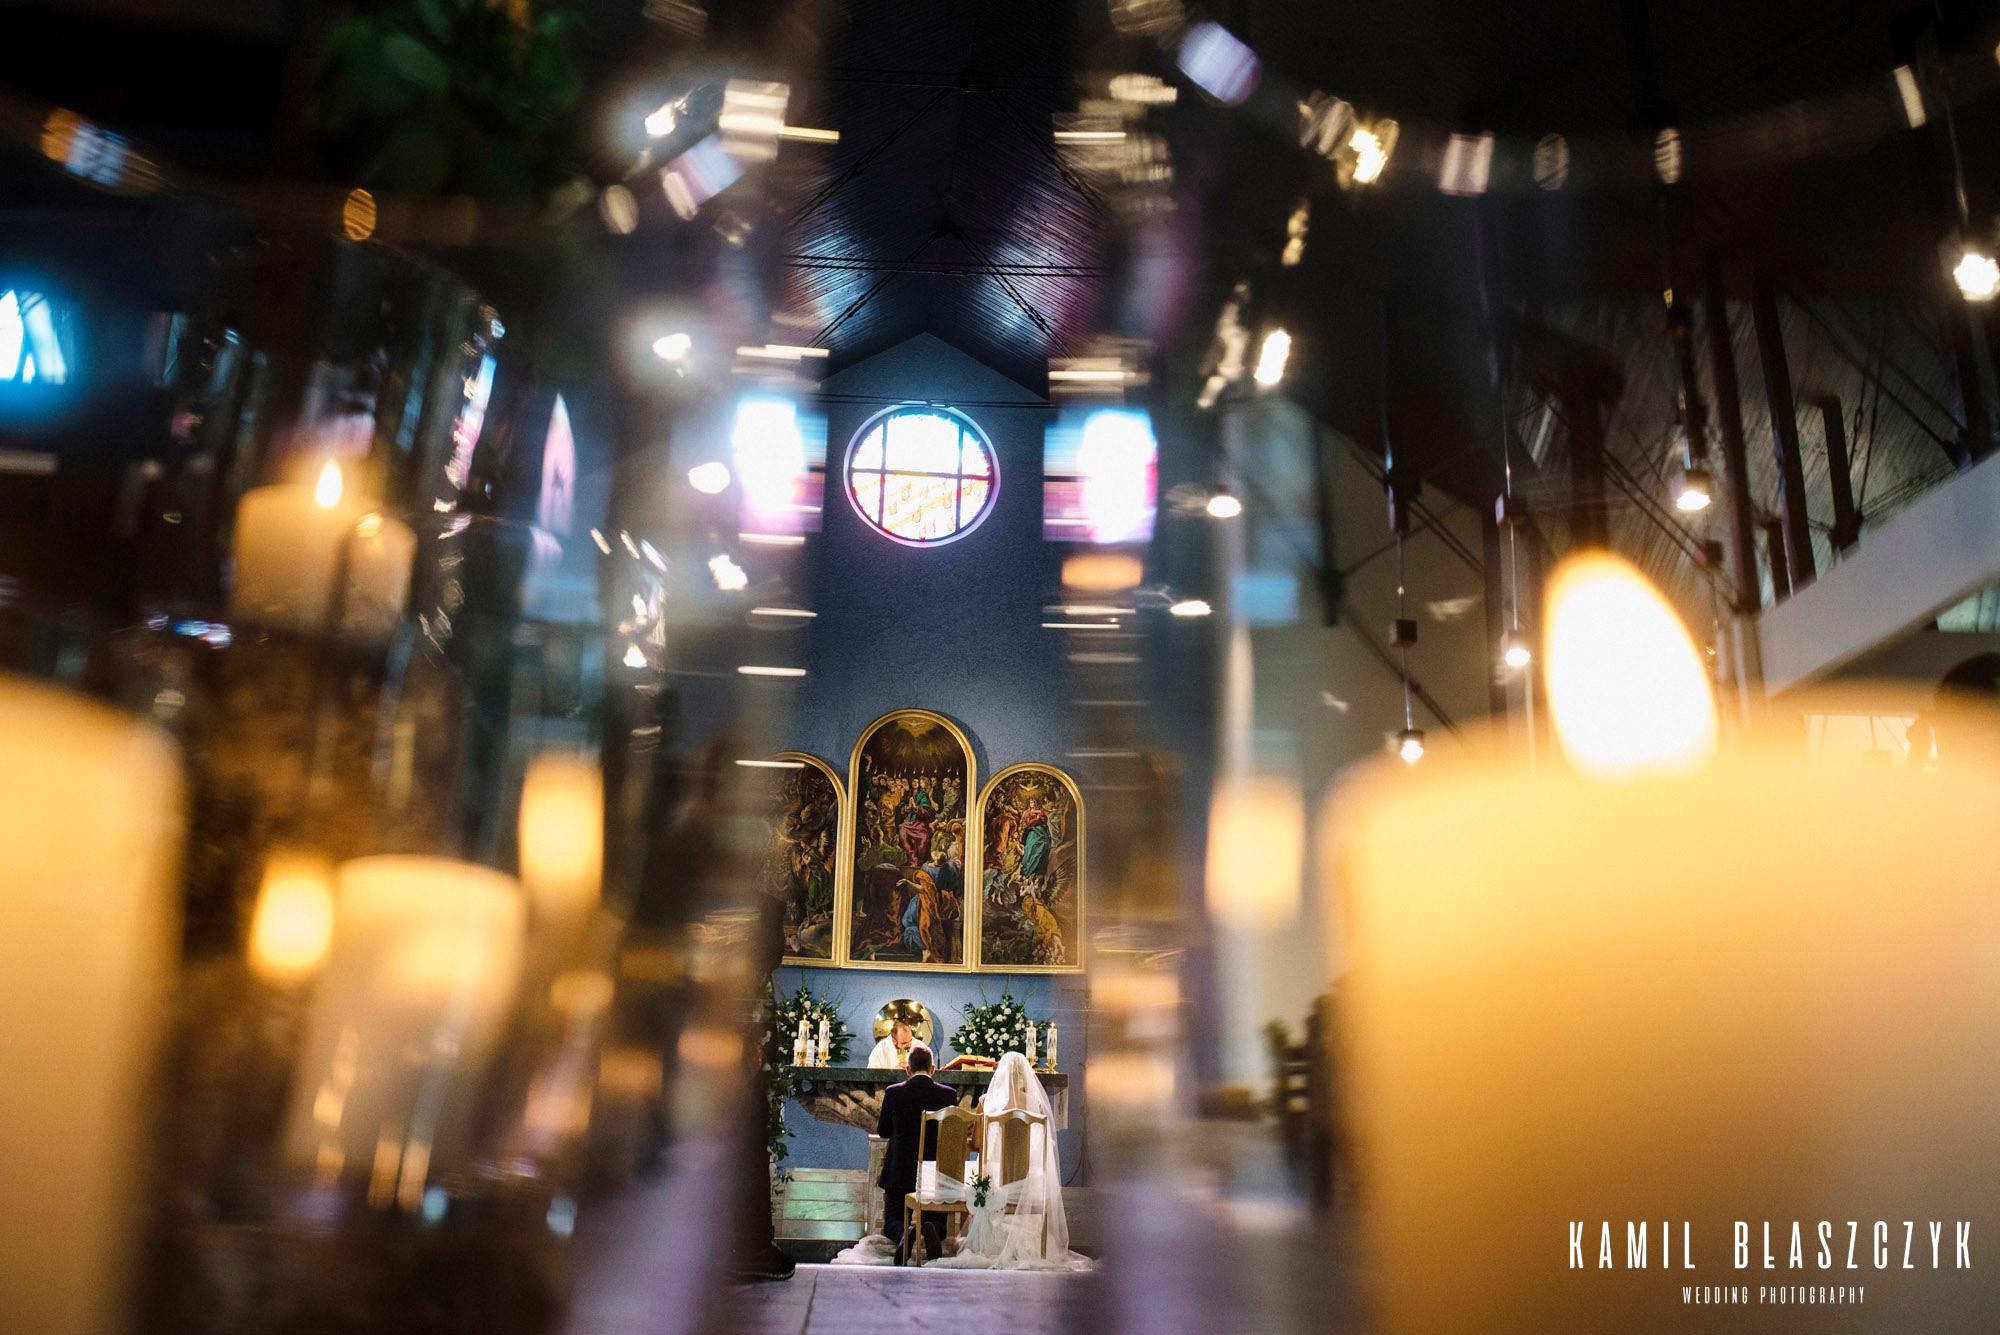 Sanktuarium Matki Boskiej Brzemiennej Matemblewo